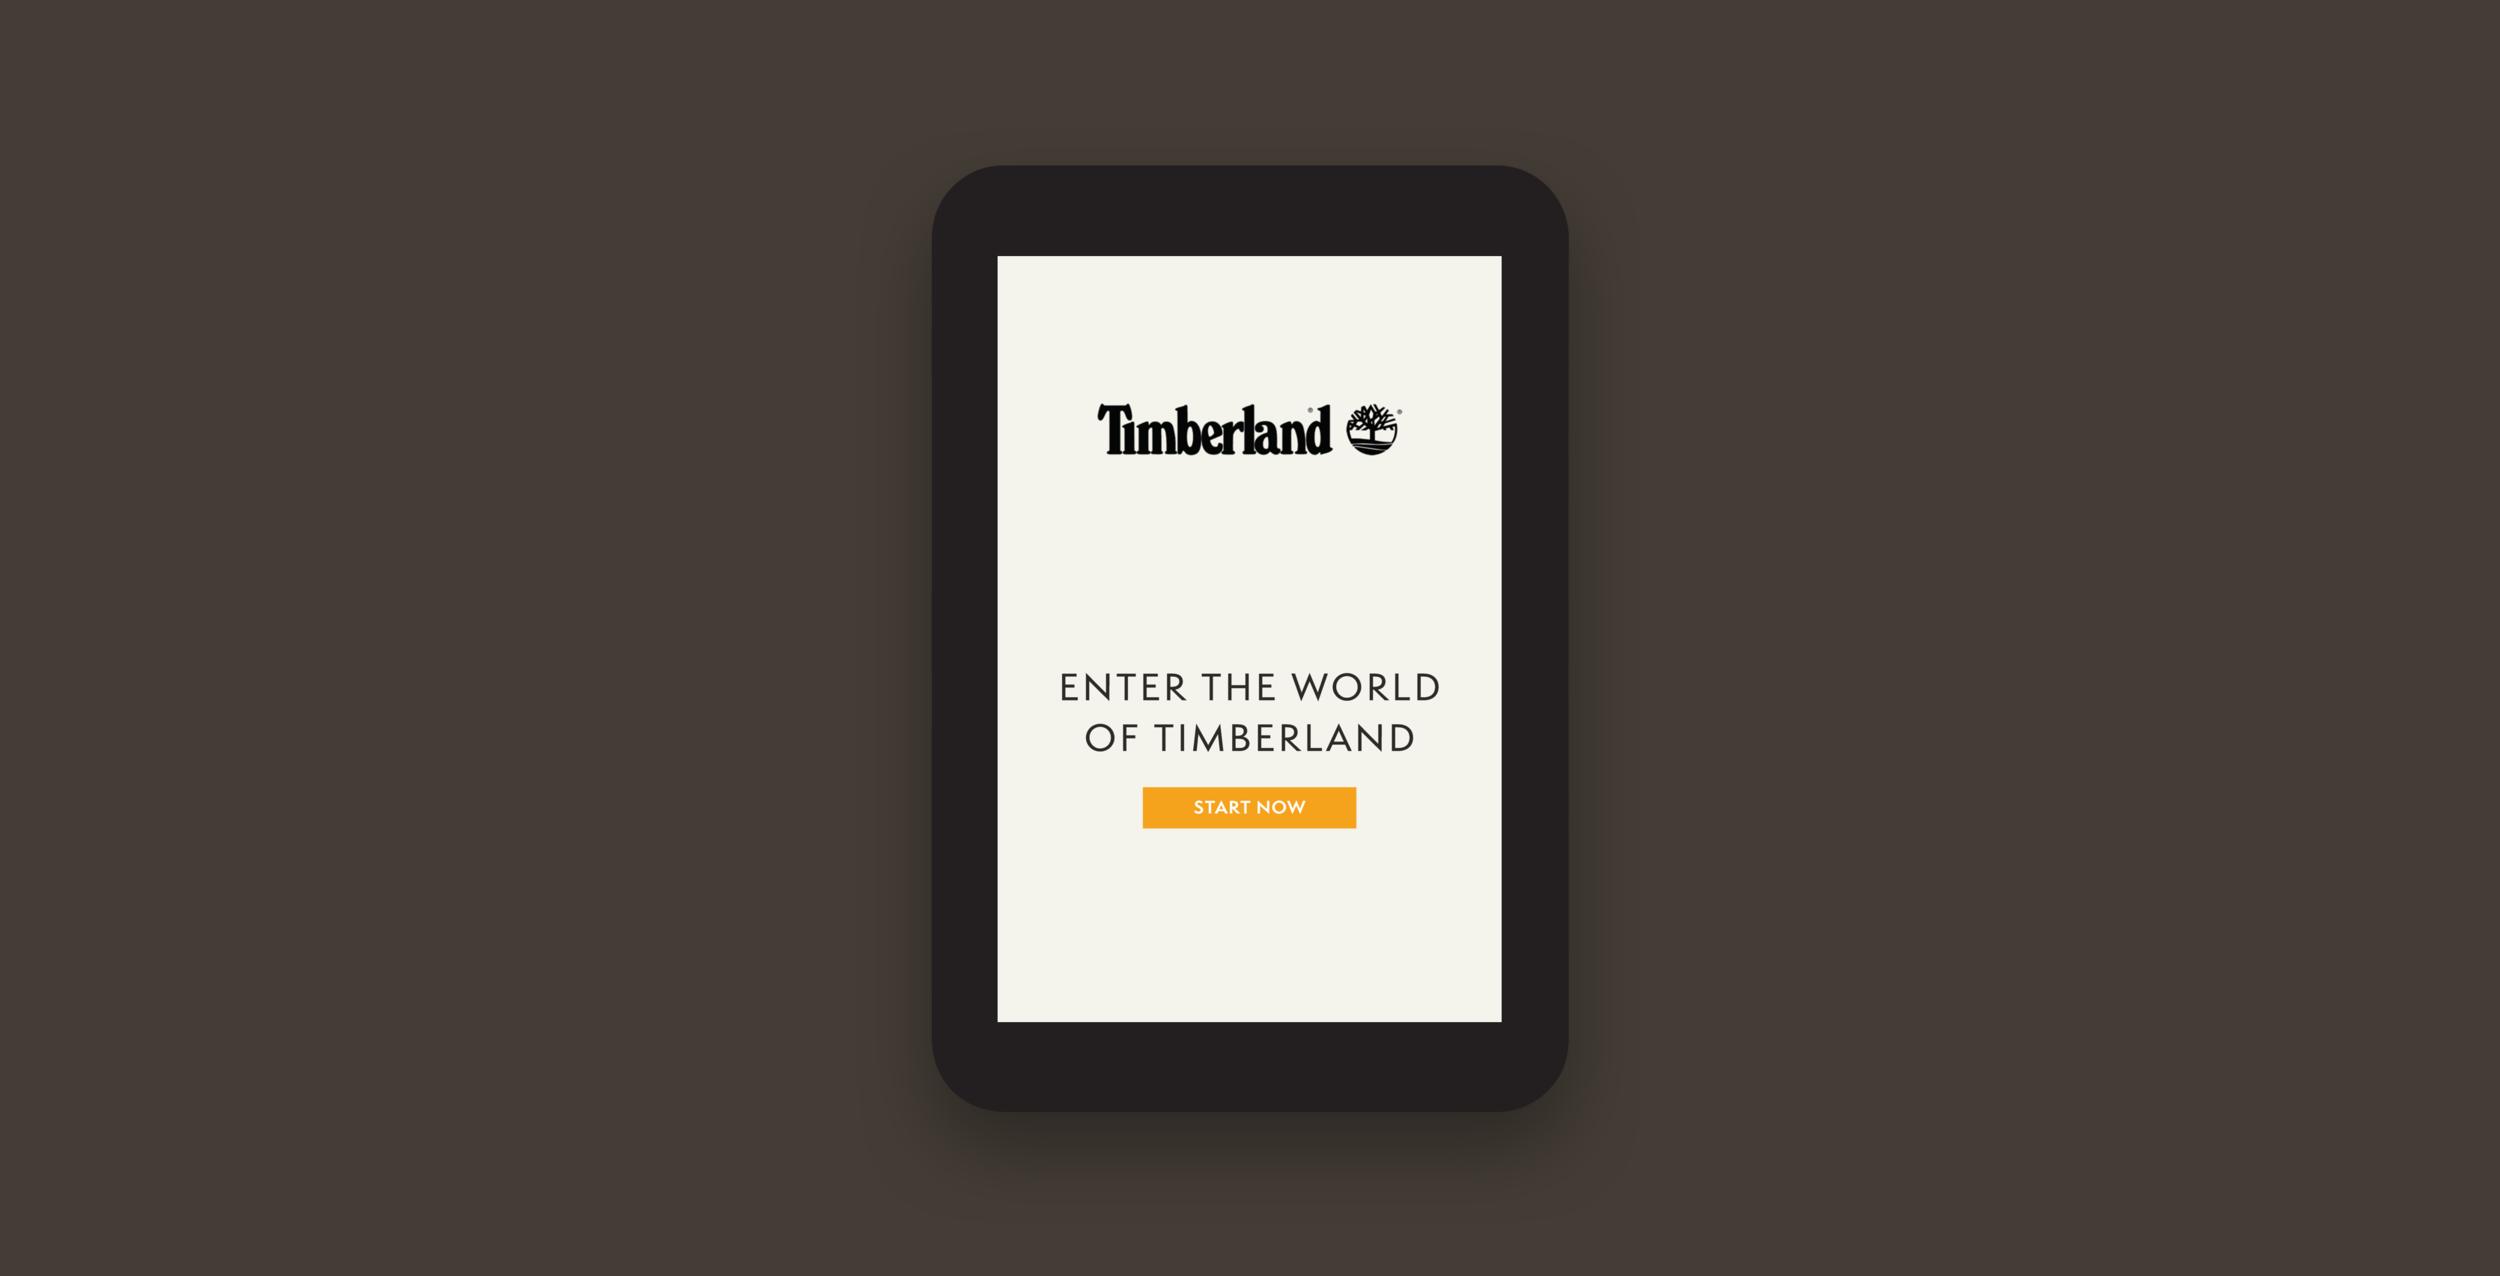 Timberland-Customer-1.png